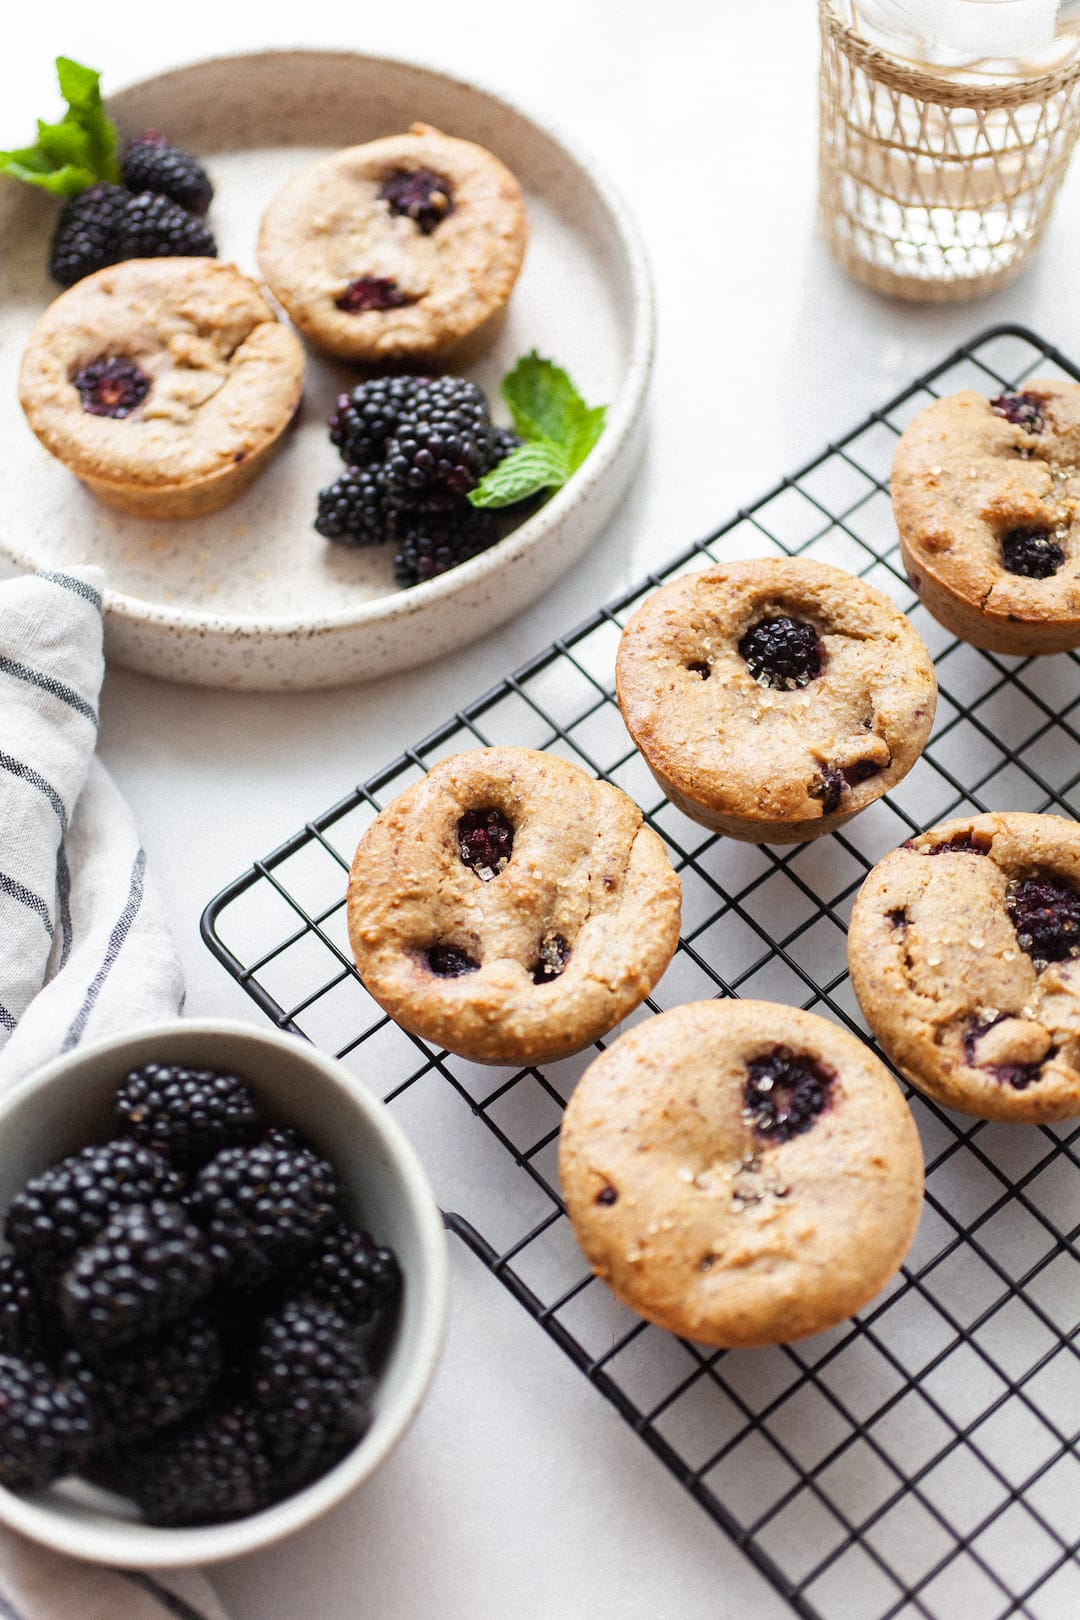 Vegan Blackberry Muffins on a cooling rack beside a bowl of blackberries